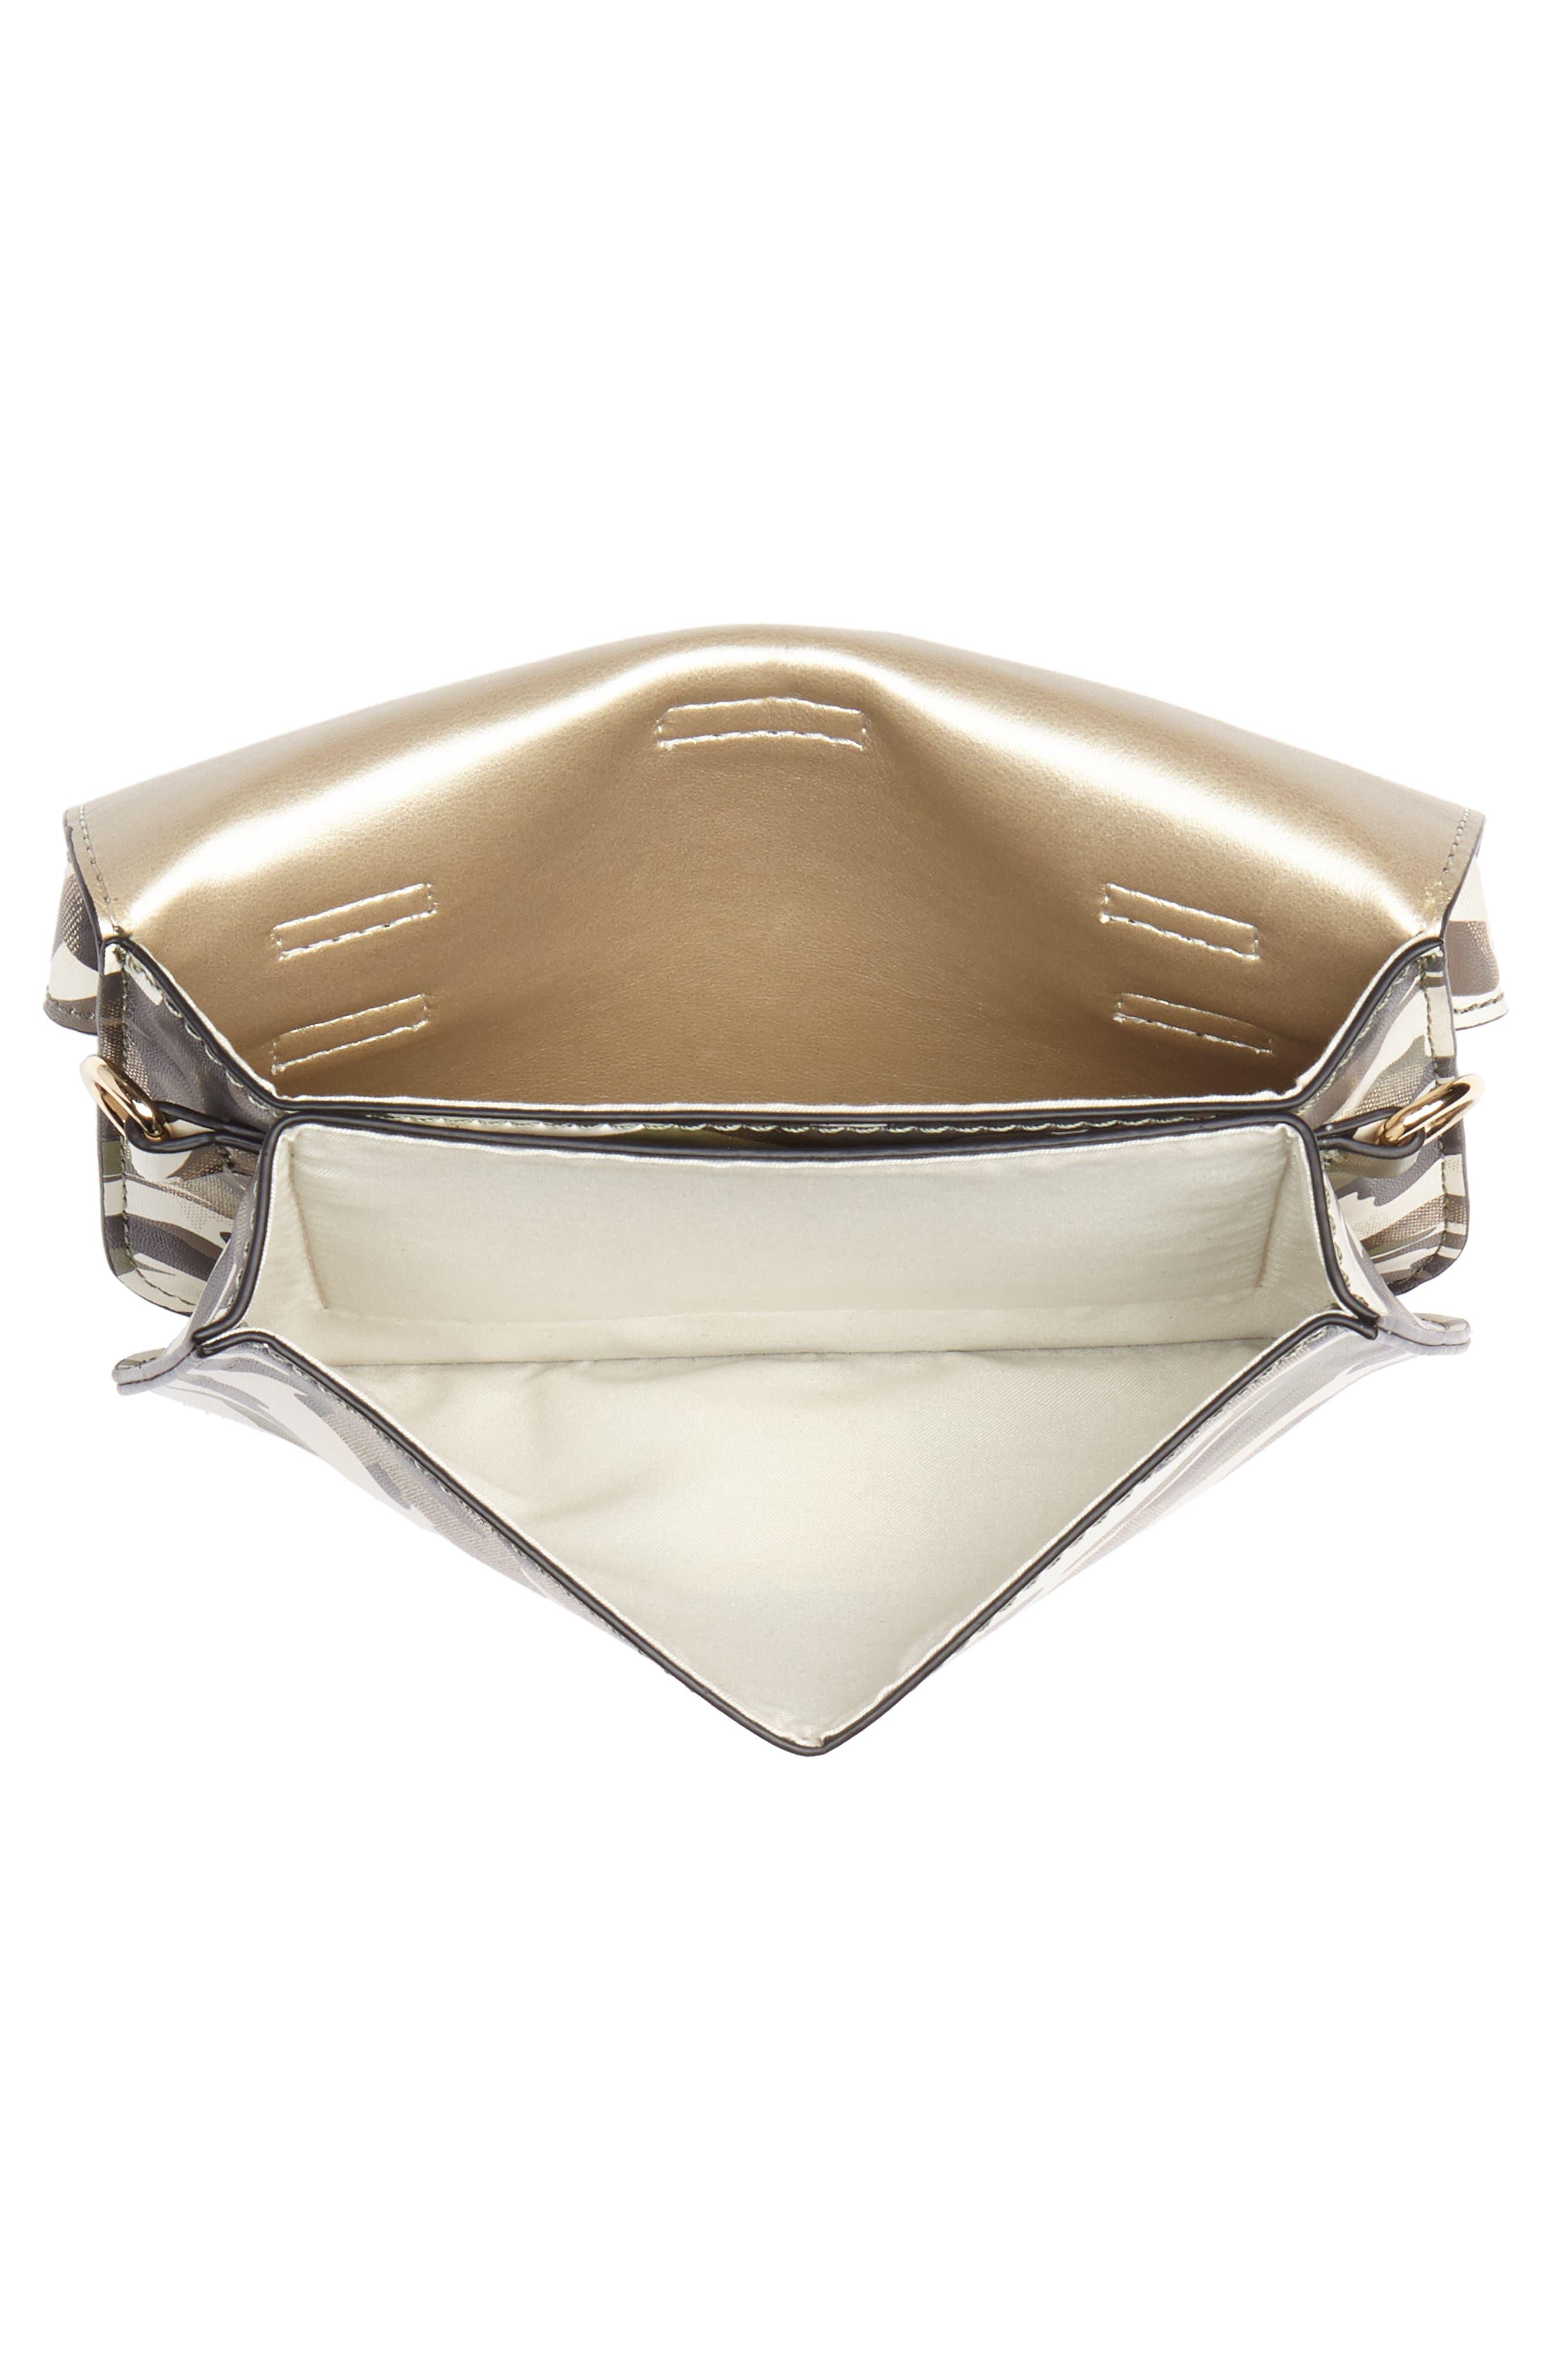 Mali + Lili Stella Camouflage Vegan Leather Crossbody Belt Bag,                             Alternate thumbnail 6, color,                             CAMOUFLAGE